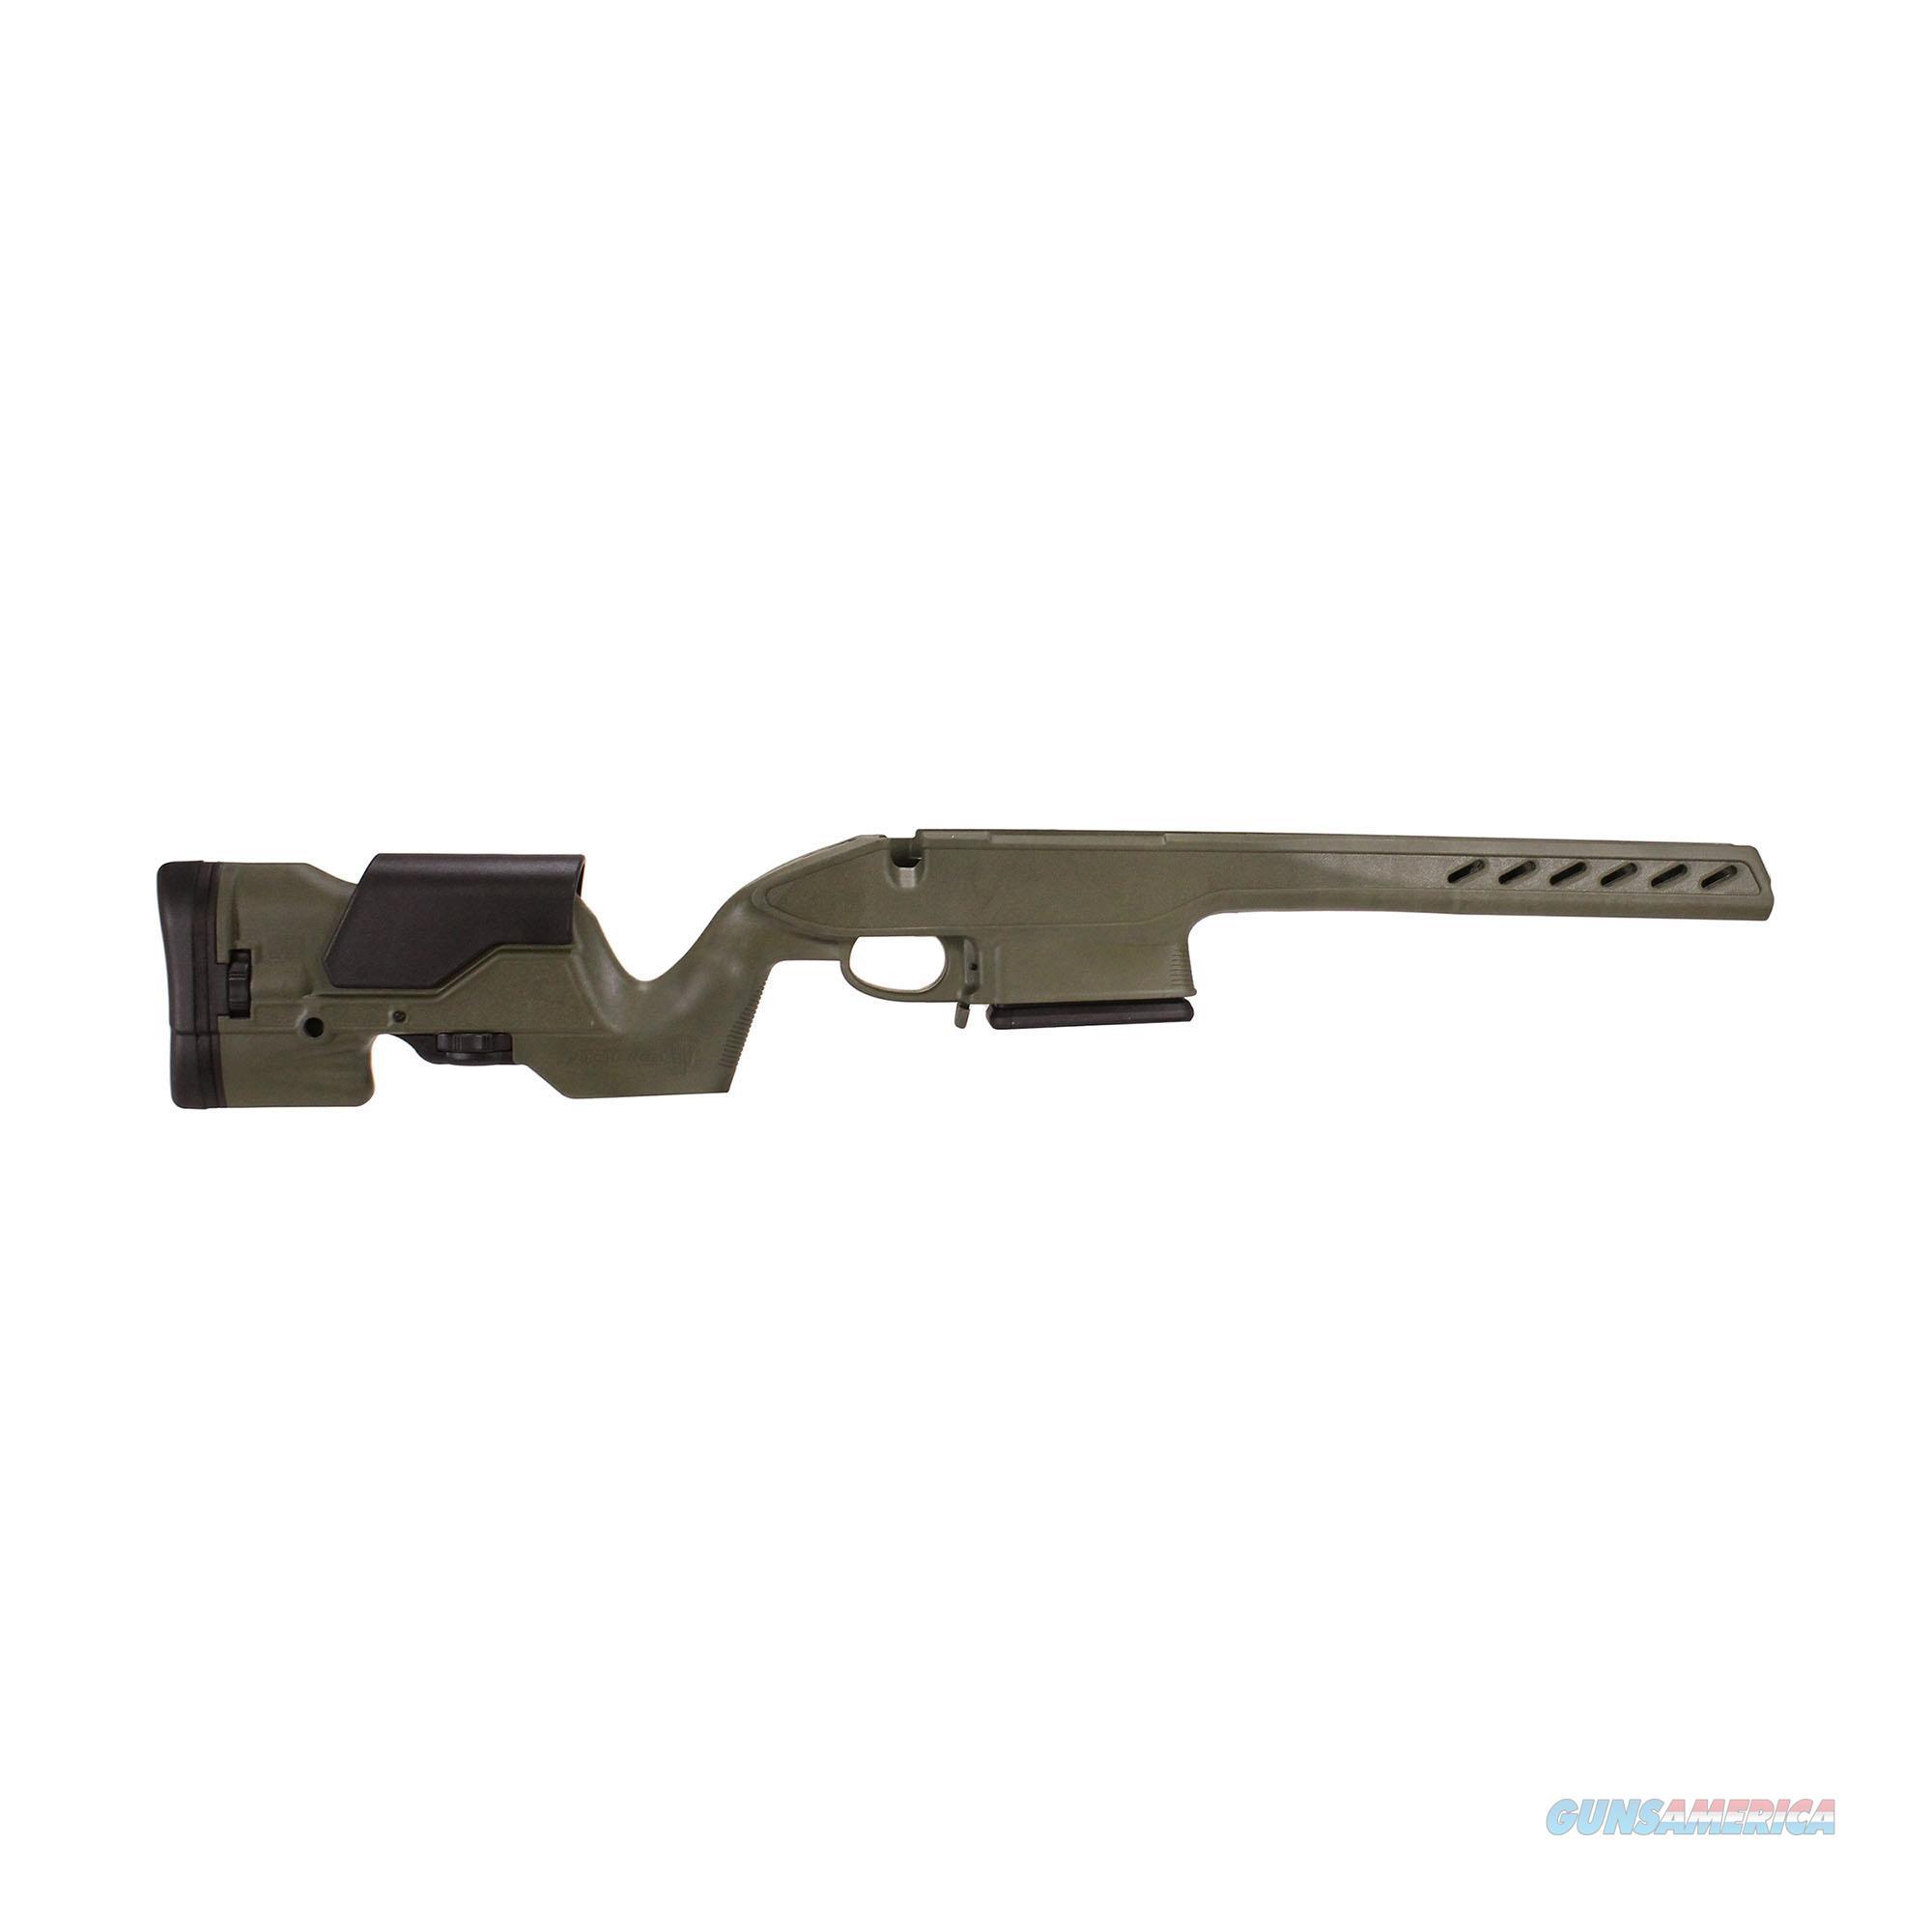 Promag Archangel 1500 Precision Stock AA1500MLA-OD  Non-Guns > Gunstocks, Grips & Wood